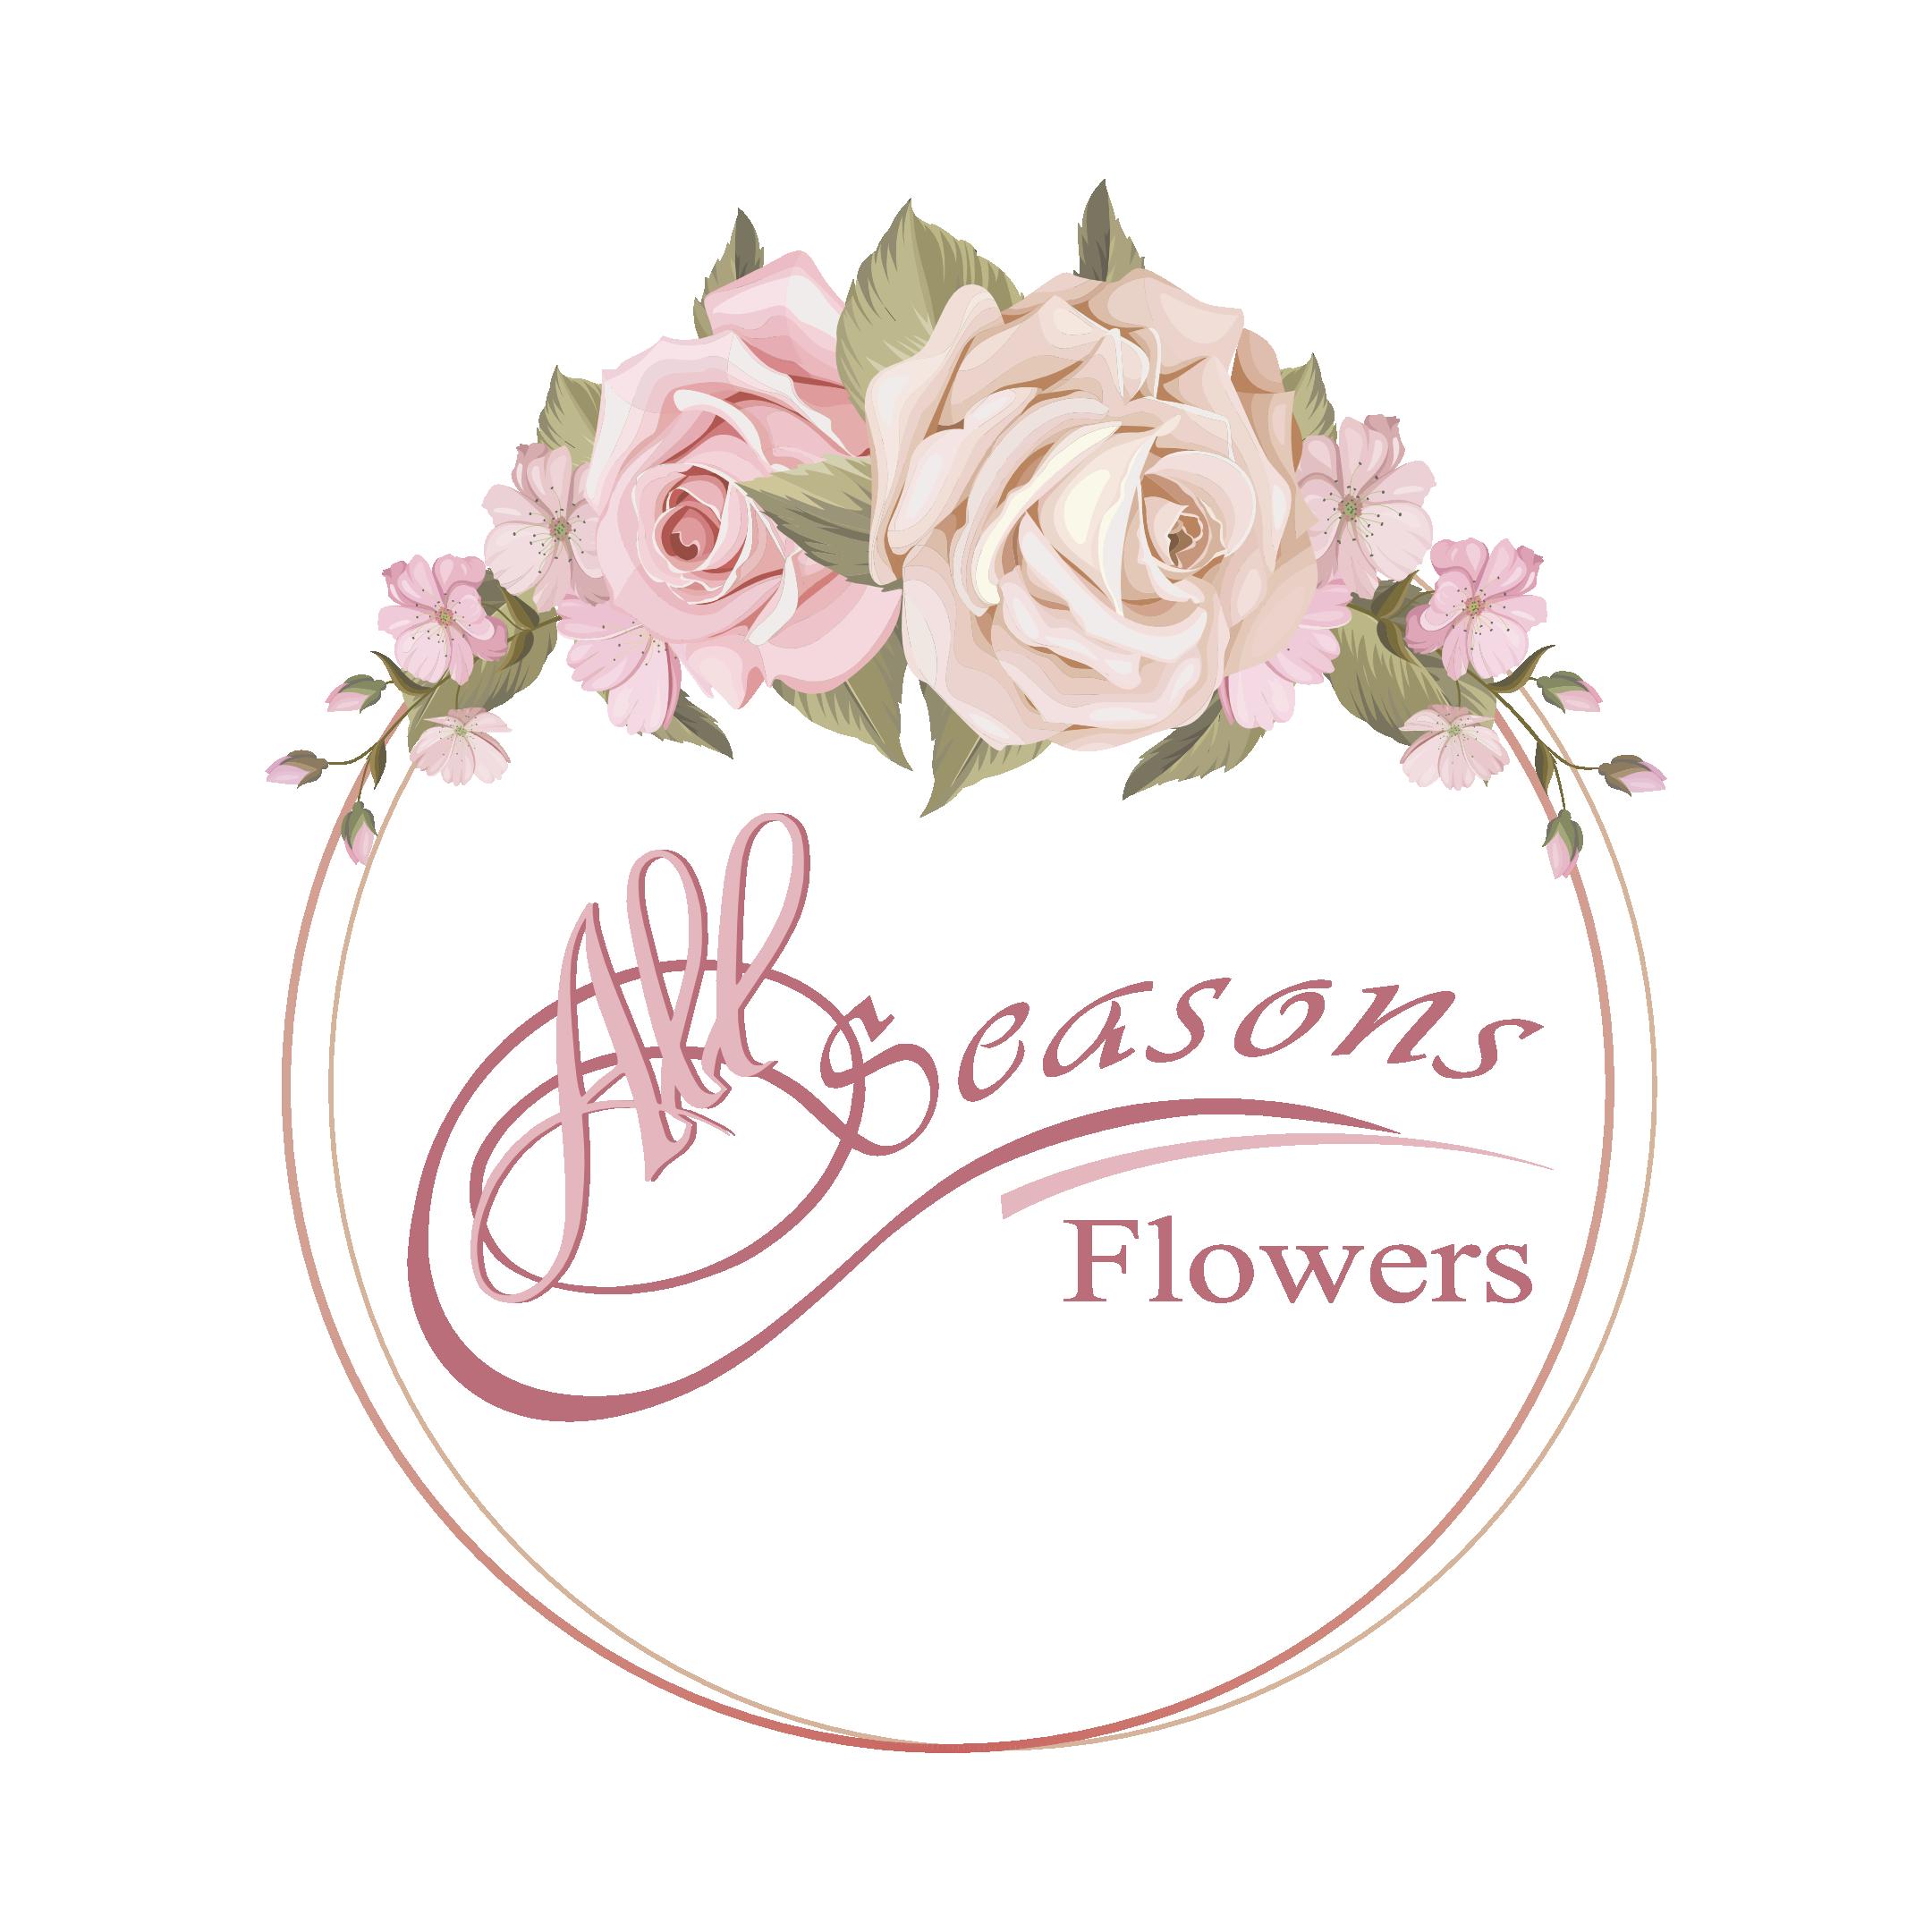 All Seasons Flowers